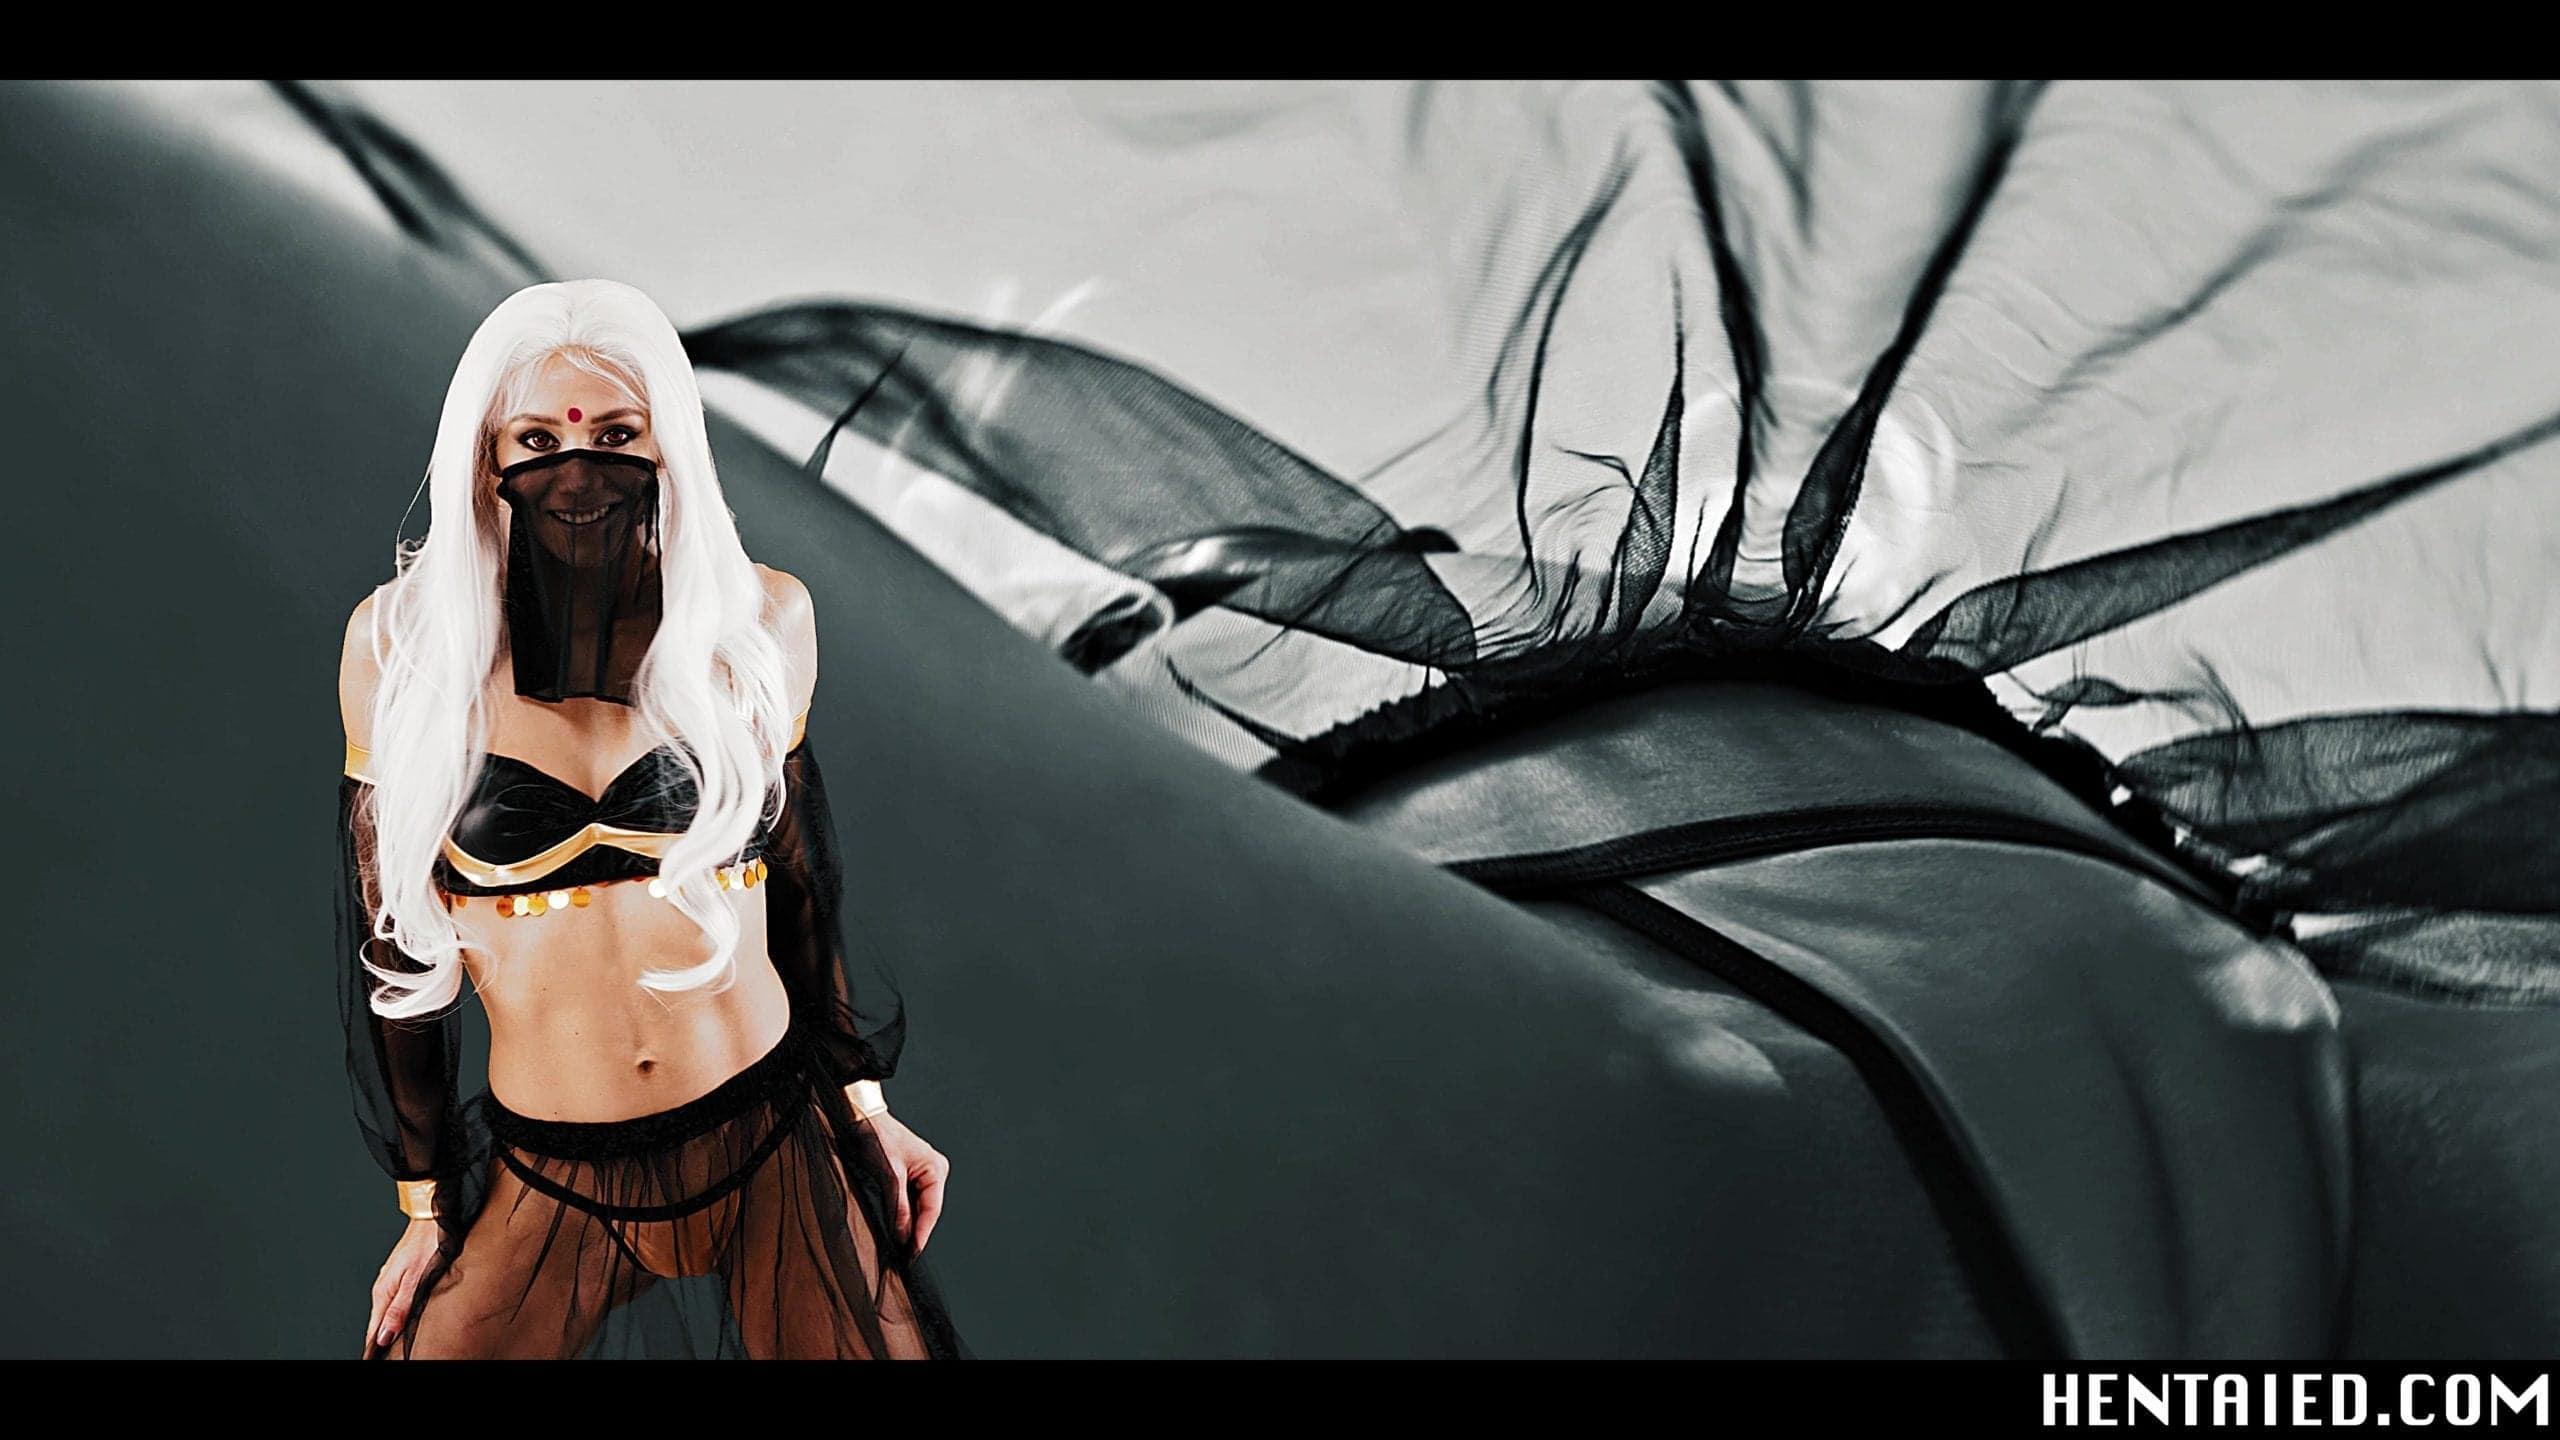 Masked pornstar Veronica Leal cosplay